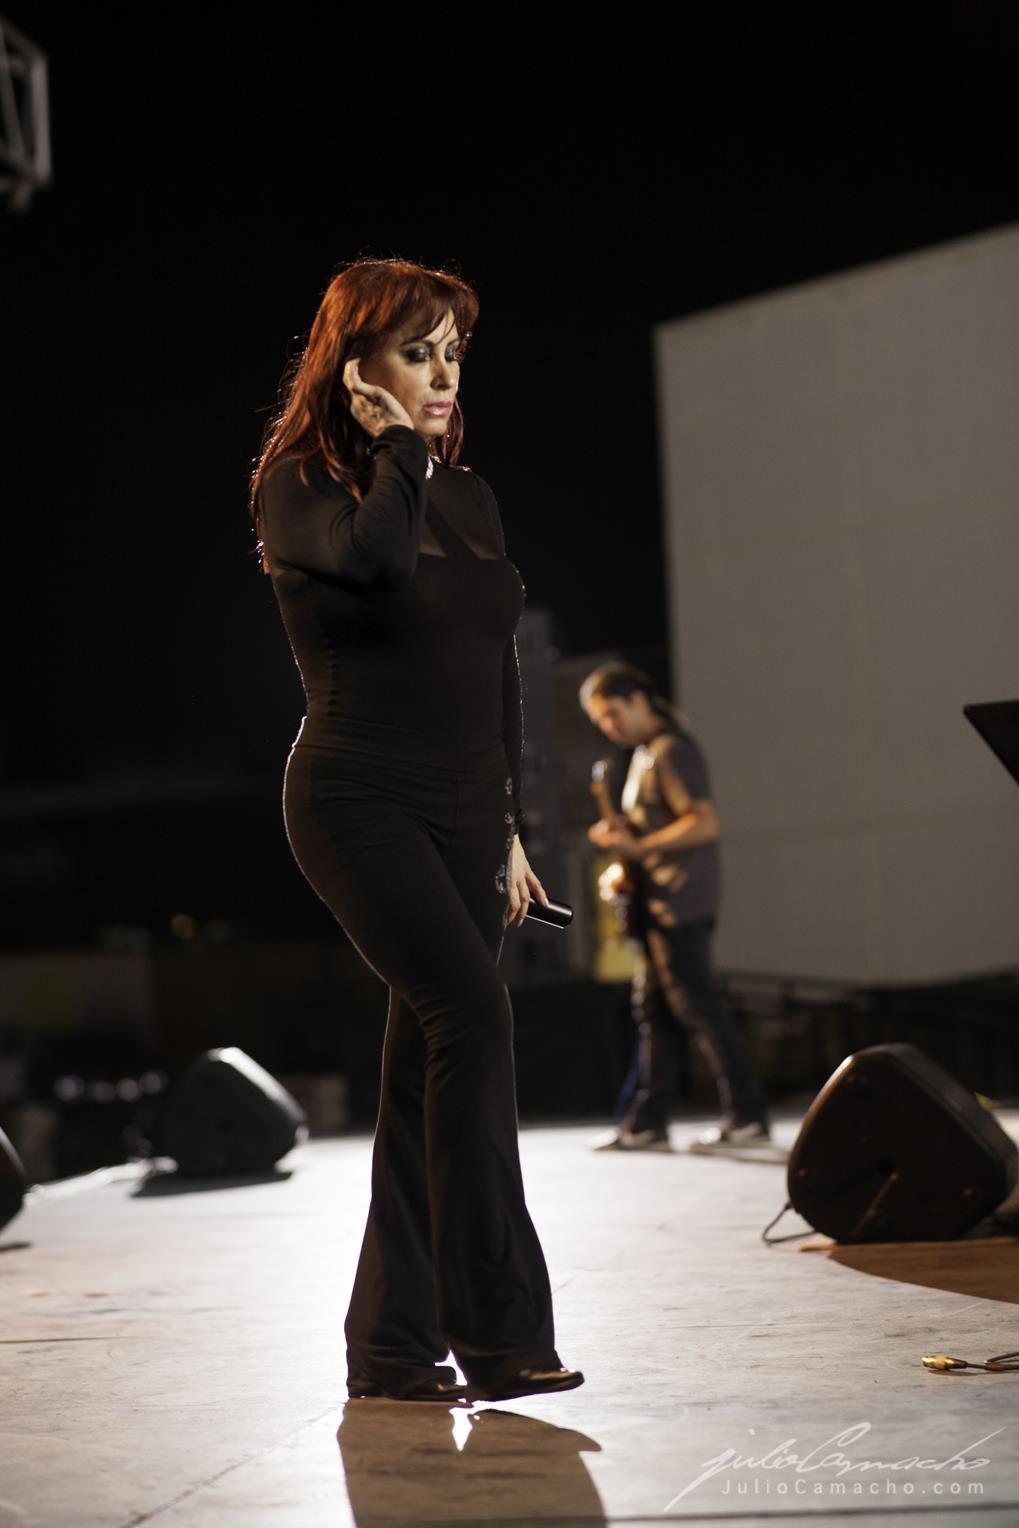 2014-10-30 31 CAST TOUR Ensenada y Tijuana - 0869 - www.Juli (Copy).jpg